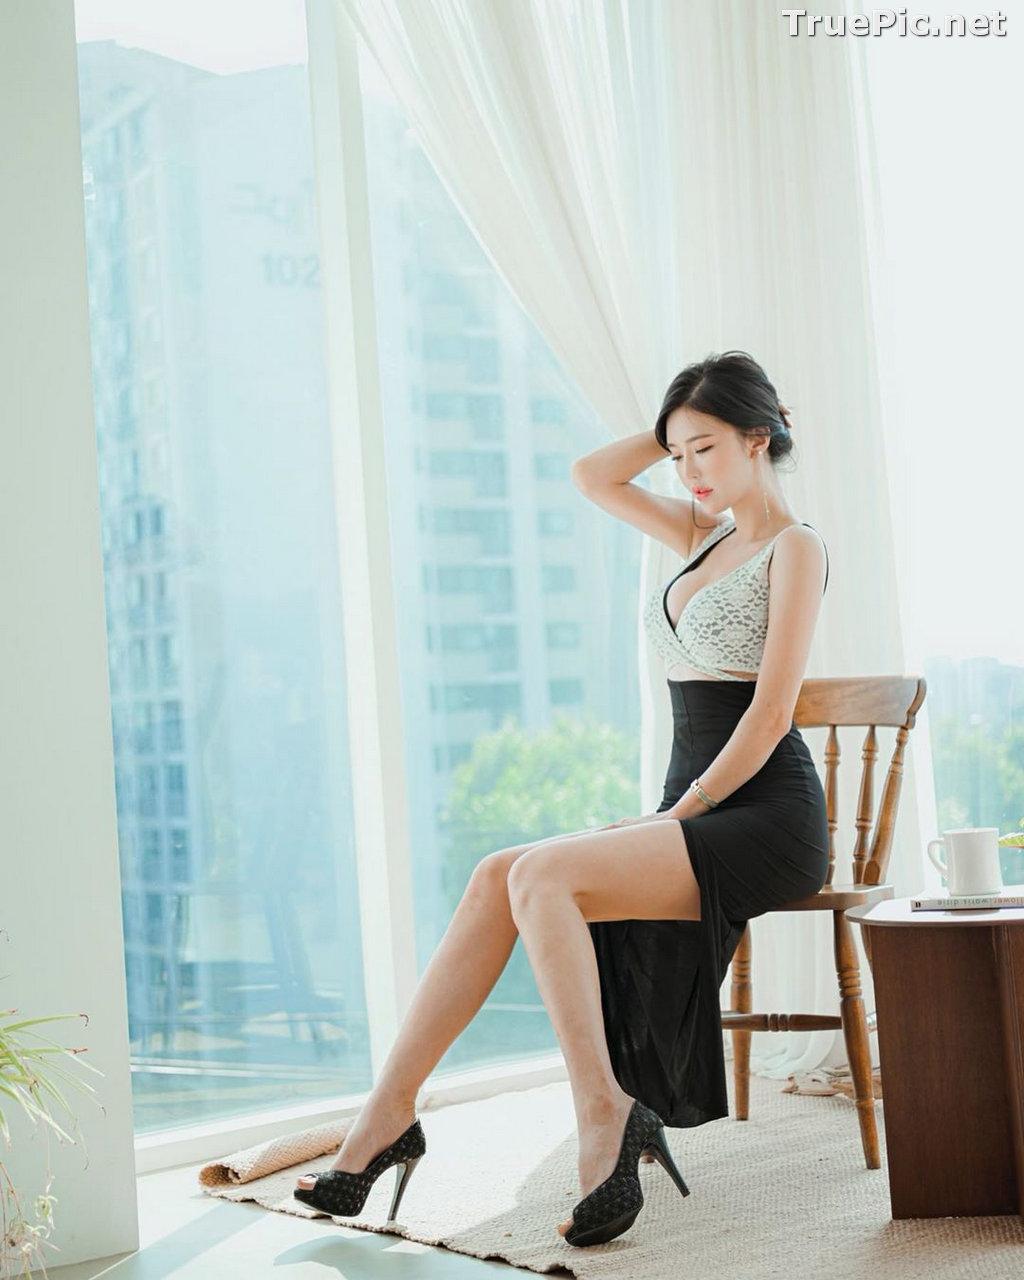 Image Korean Sexy Model - Choi Byeol Ha (최별하) Hot Photos 2020 - TruePic.net - Picture-4